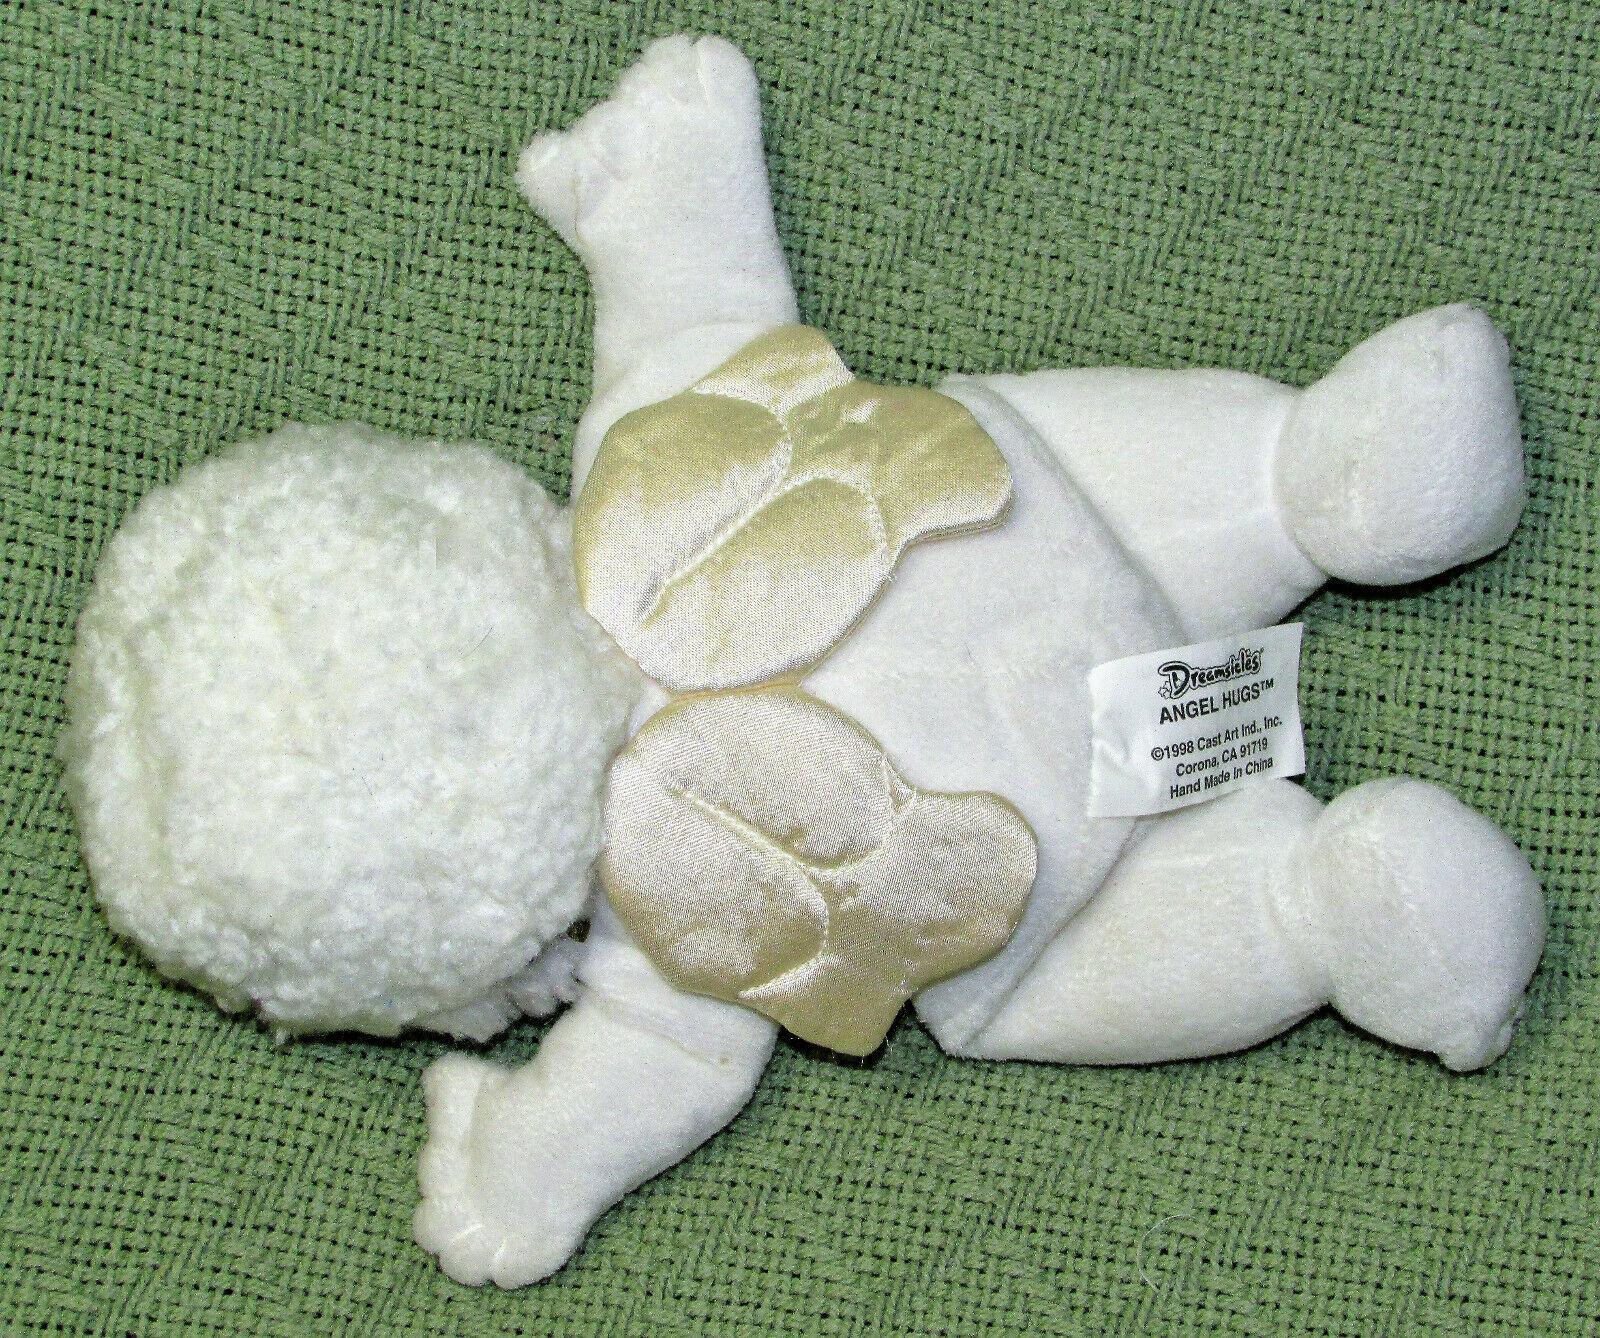 1999 DREAMSICLES ANGEL HUGS BEANBAG VINTAGE STUFFED ANIMAL PLUSH DOLL SATIN WING image 3